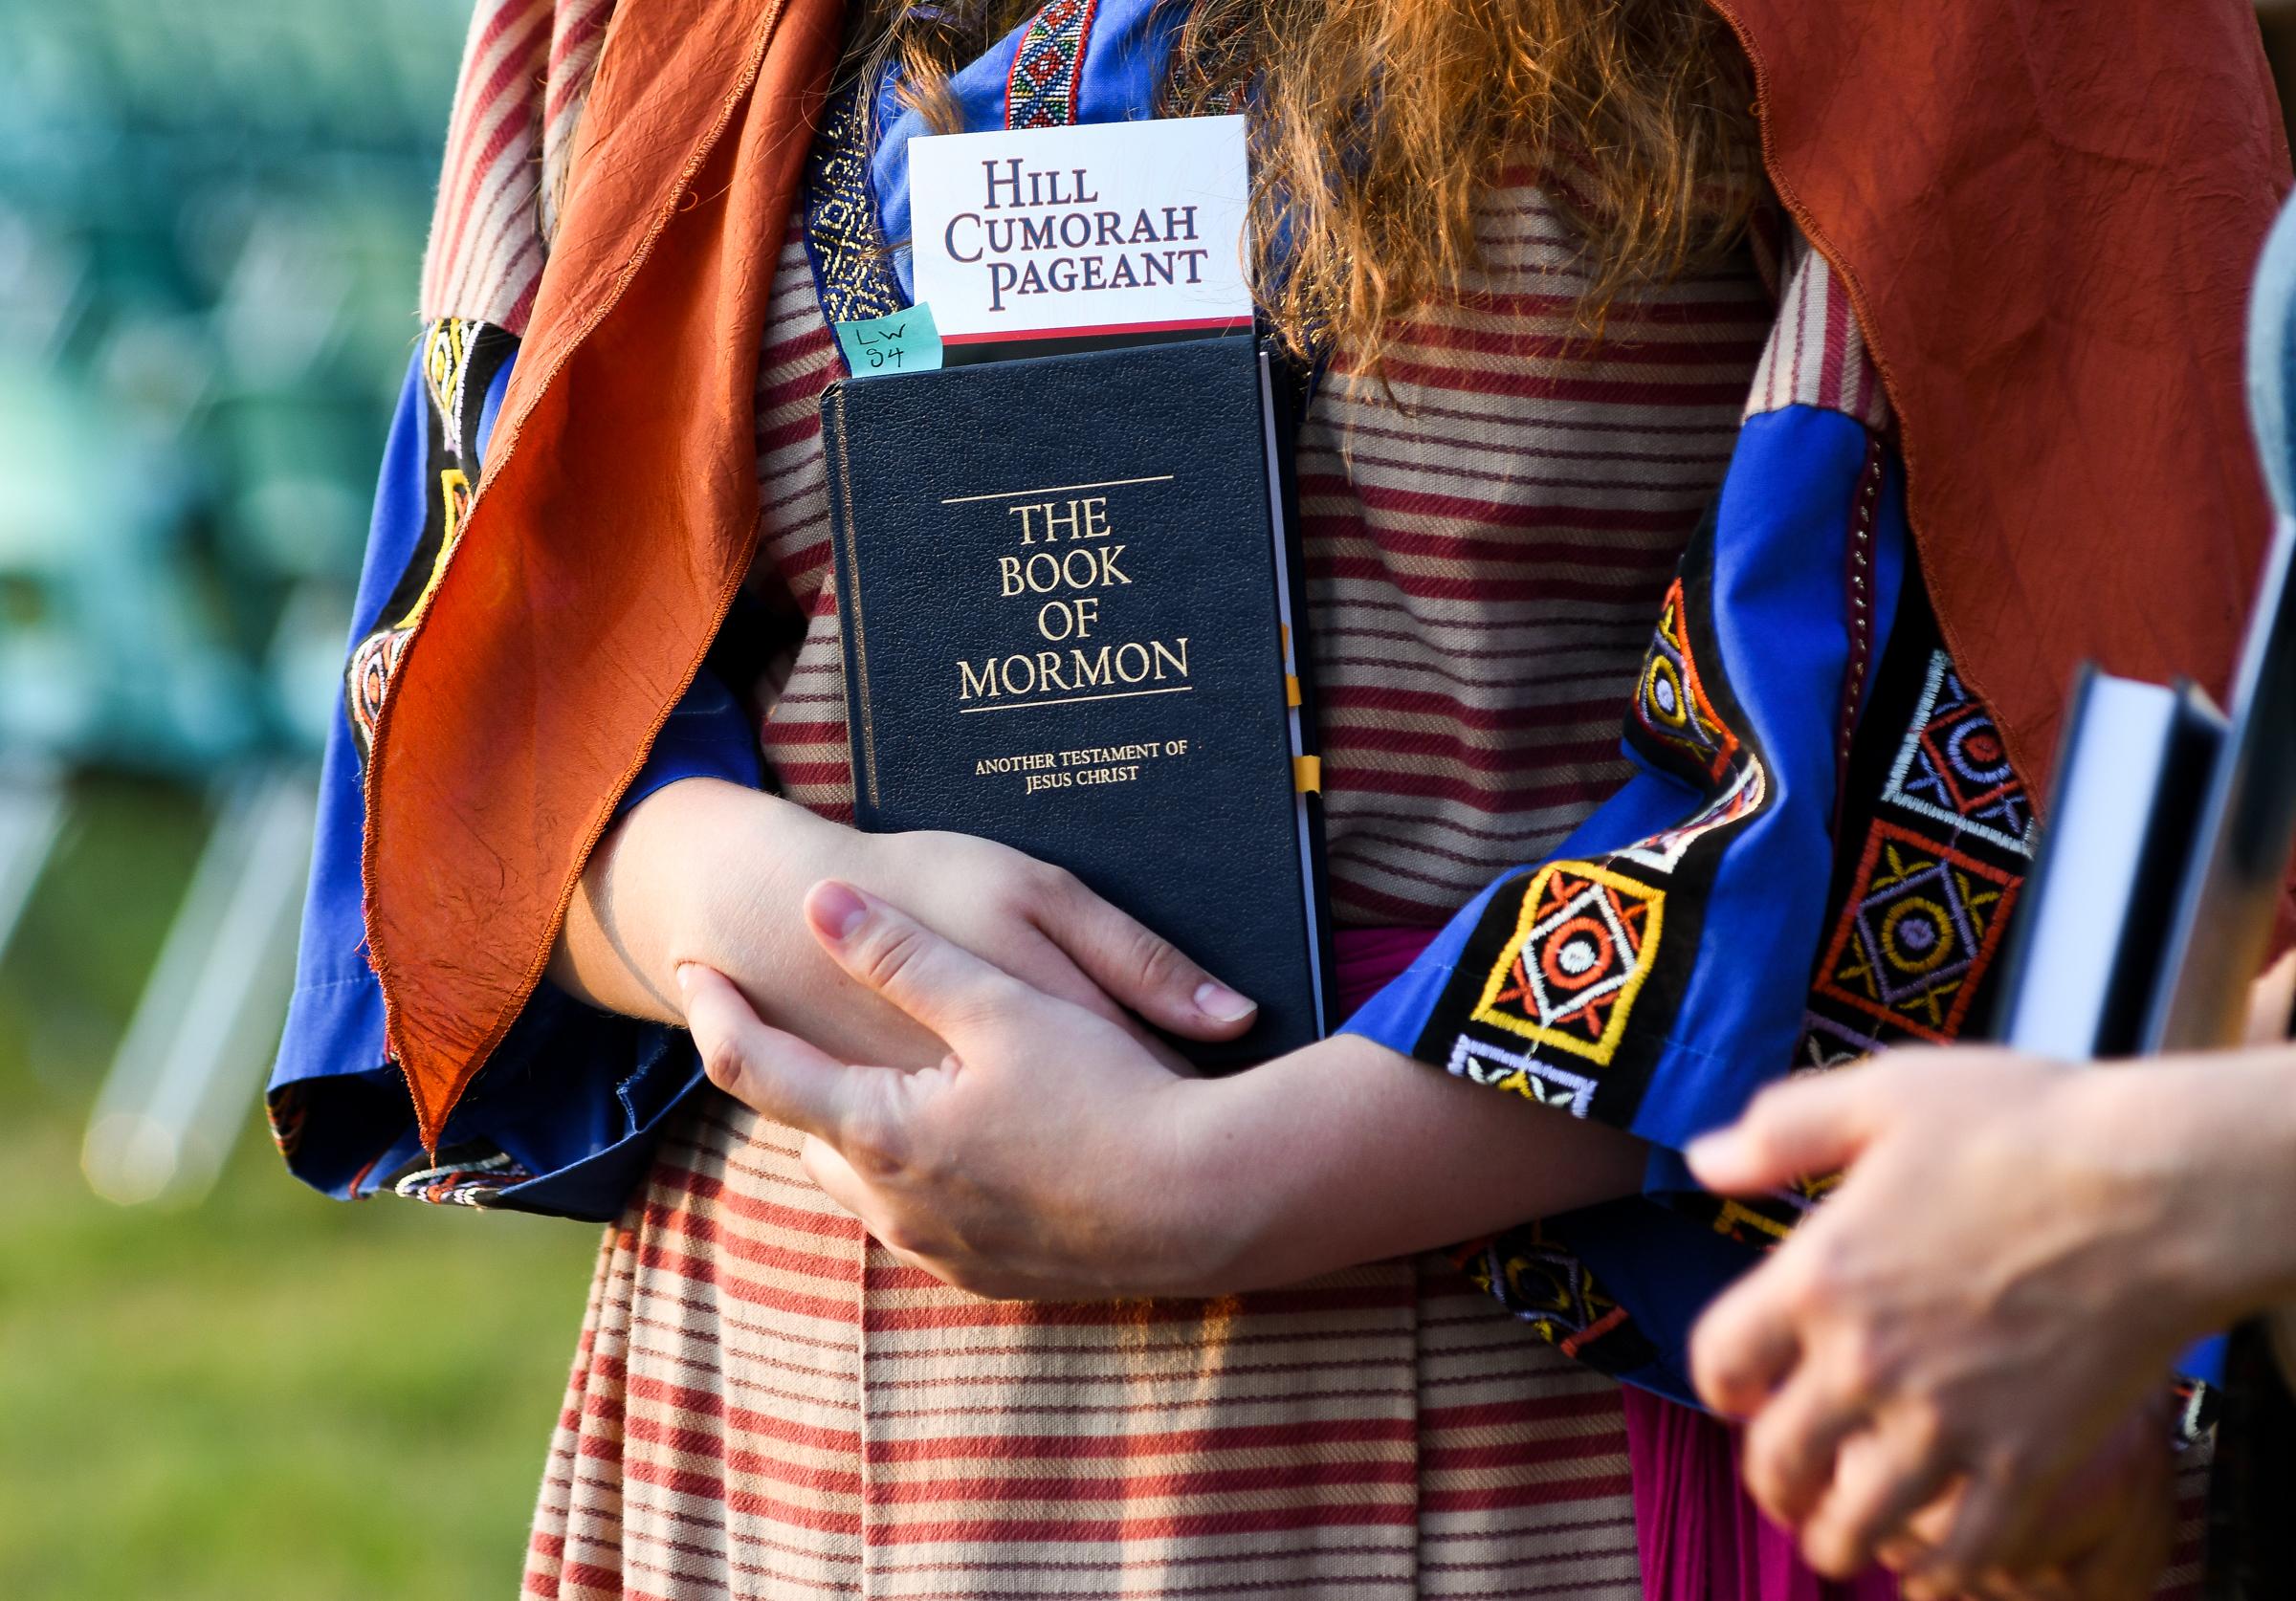 Mormonism's Sci-Fi Swan Song